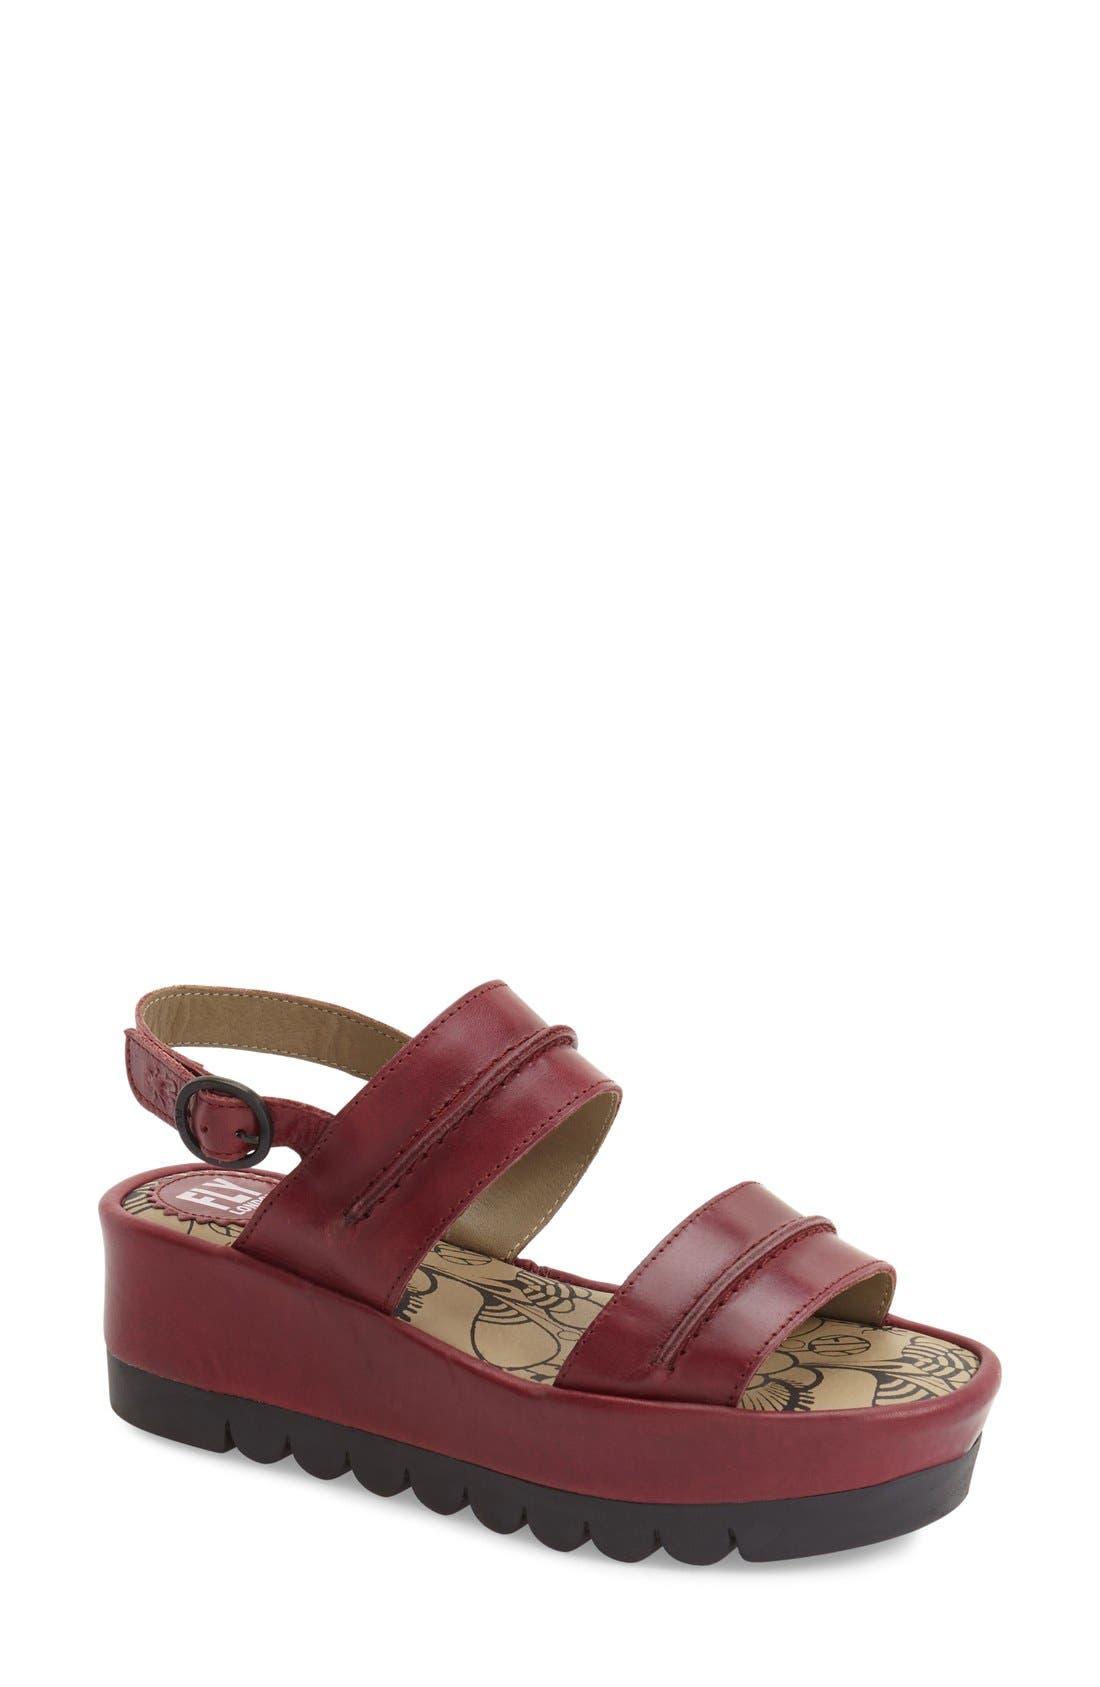 Main Image - Fly London 'Baku' Platform Sandal (Women)